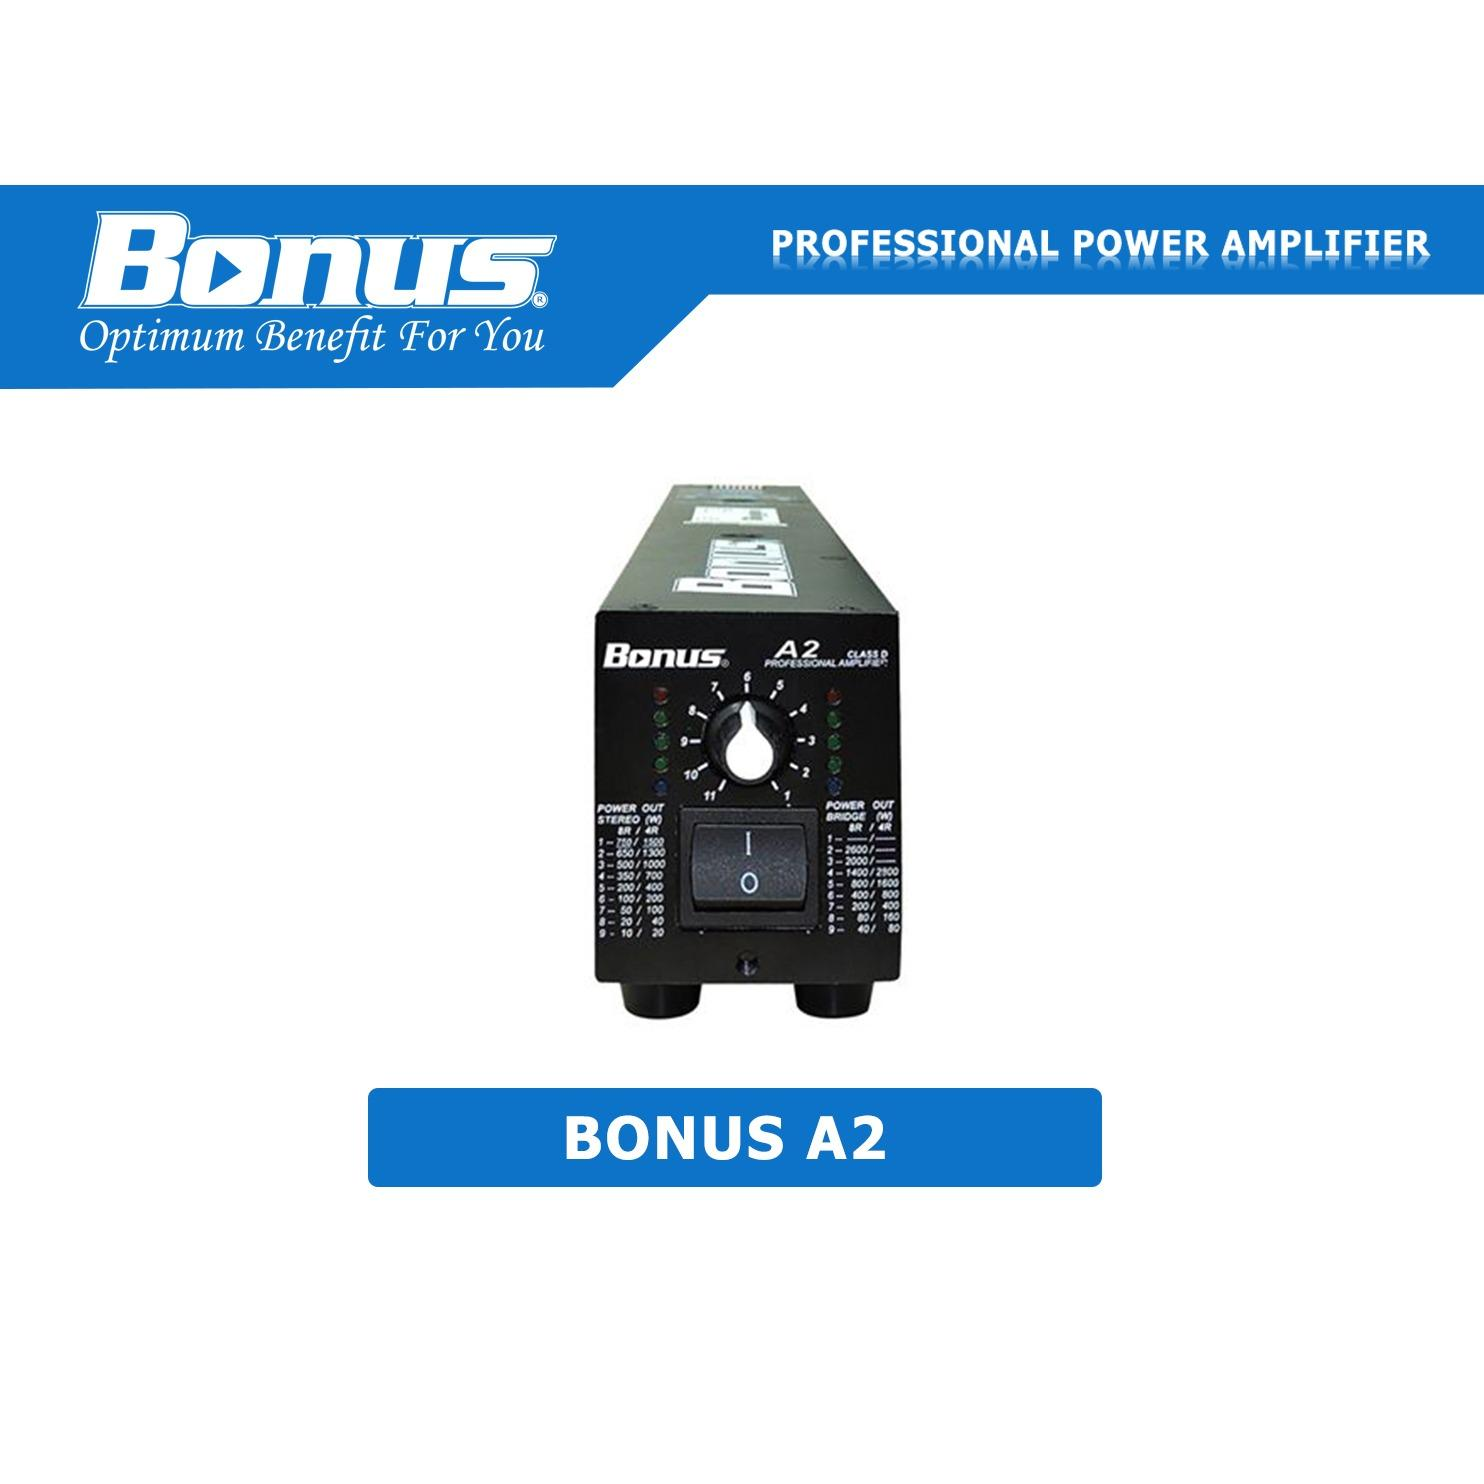 Cục Đẩy Power Amplifier Bonus Audio A2 Oem Rẻ Trong Hồ Chí Minh